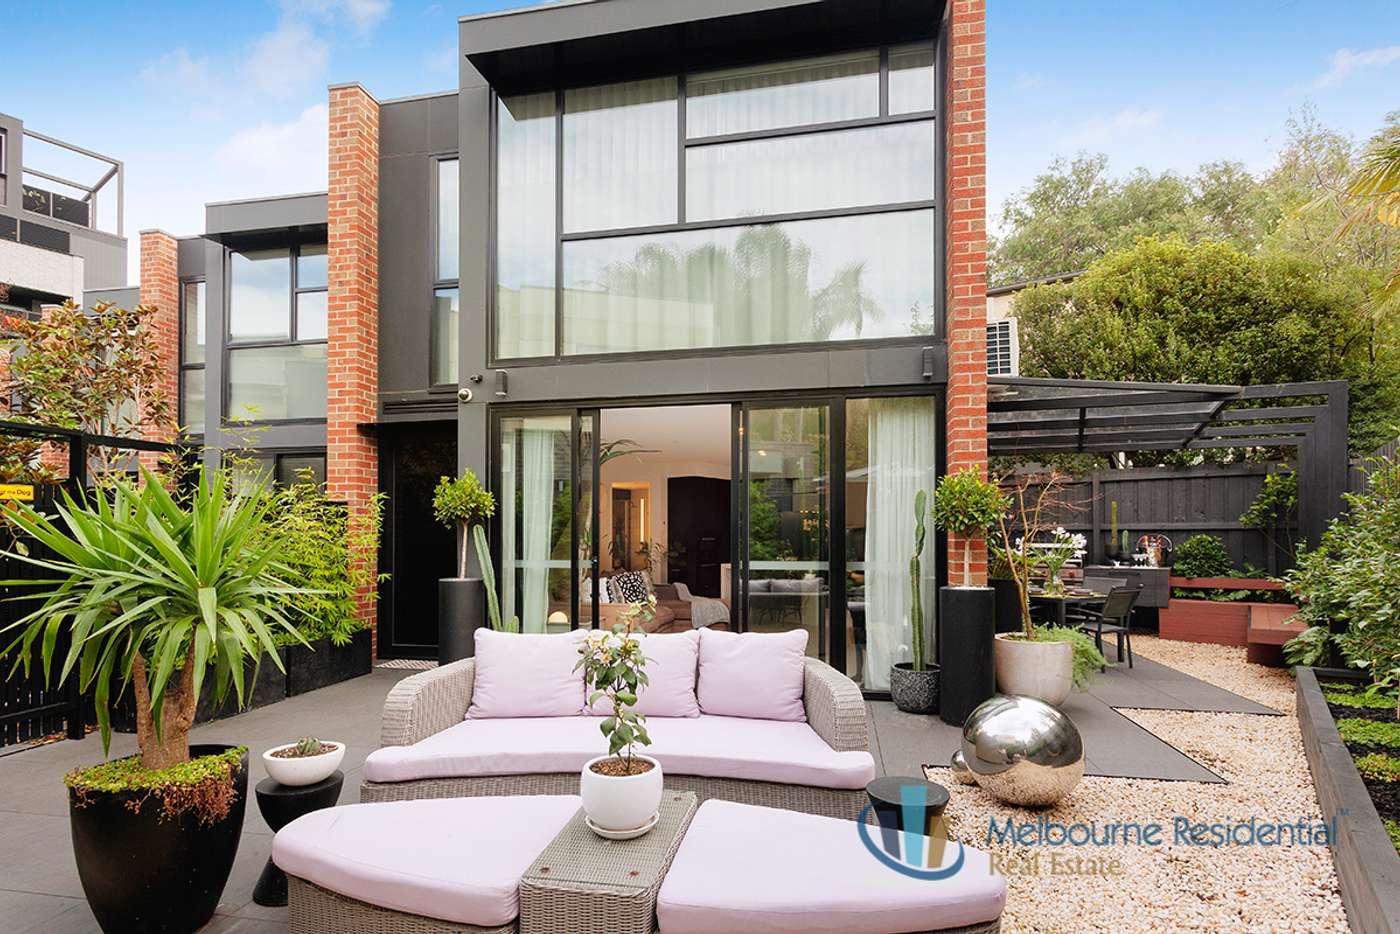 Main view of Homely house listing, 14/80 Carlisle Street, St Kilda VIC 3182